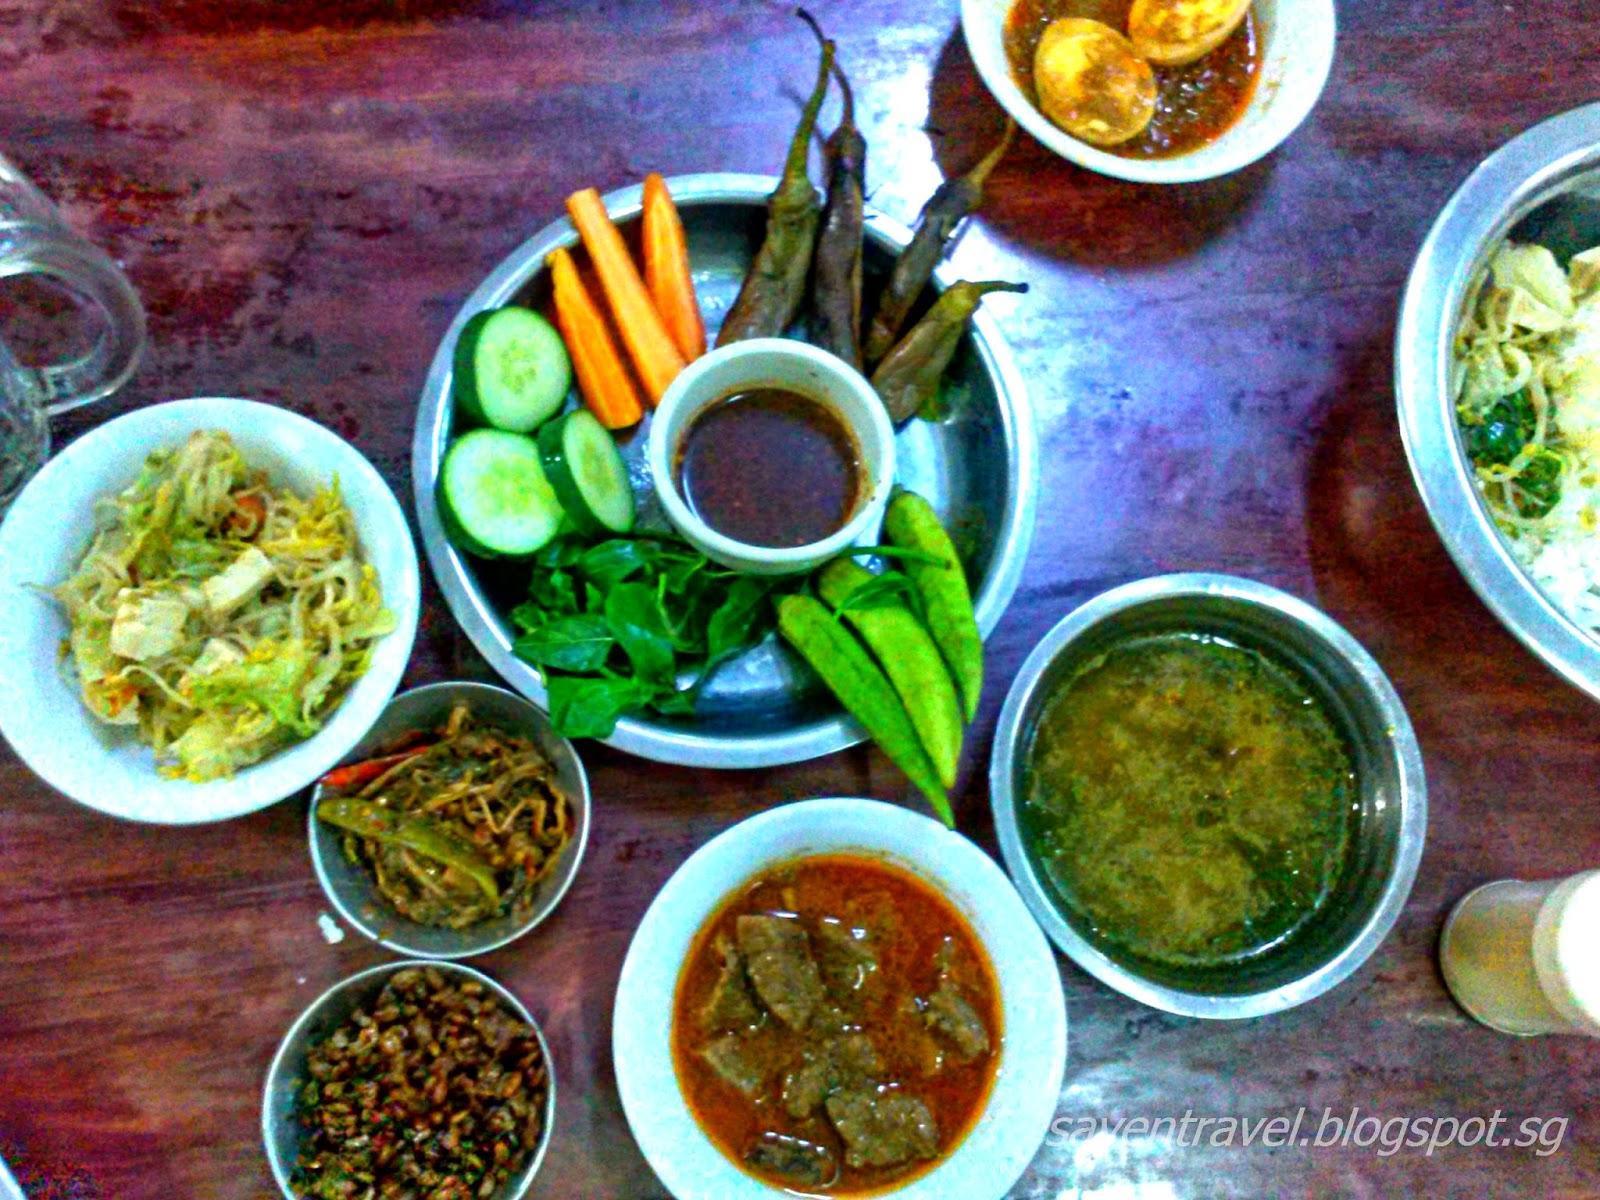 Hotel Yangon Seafood Restaurant